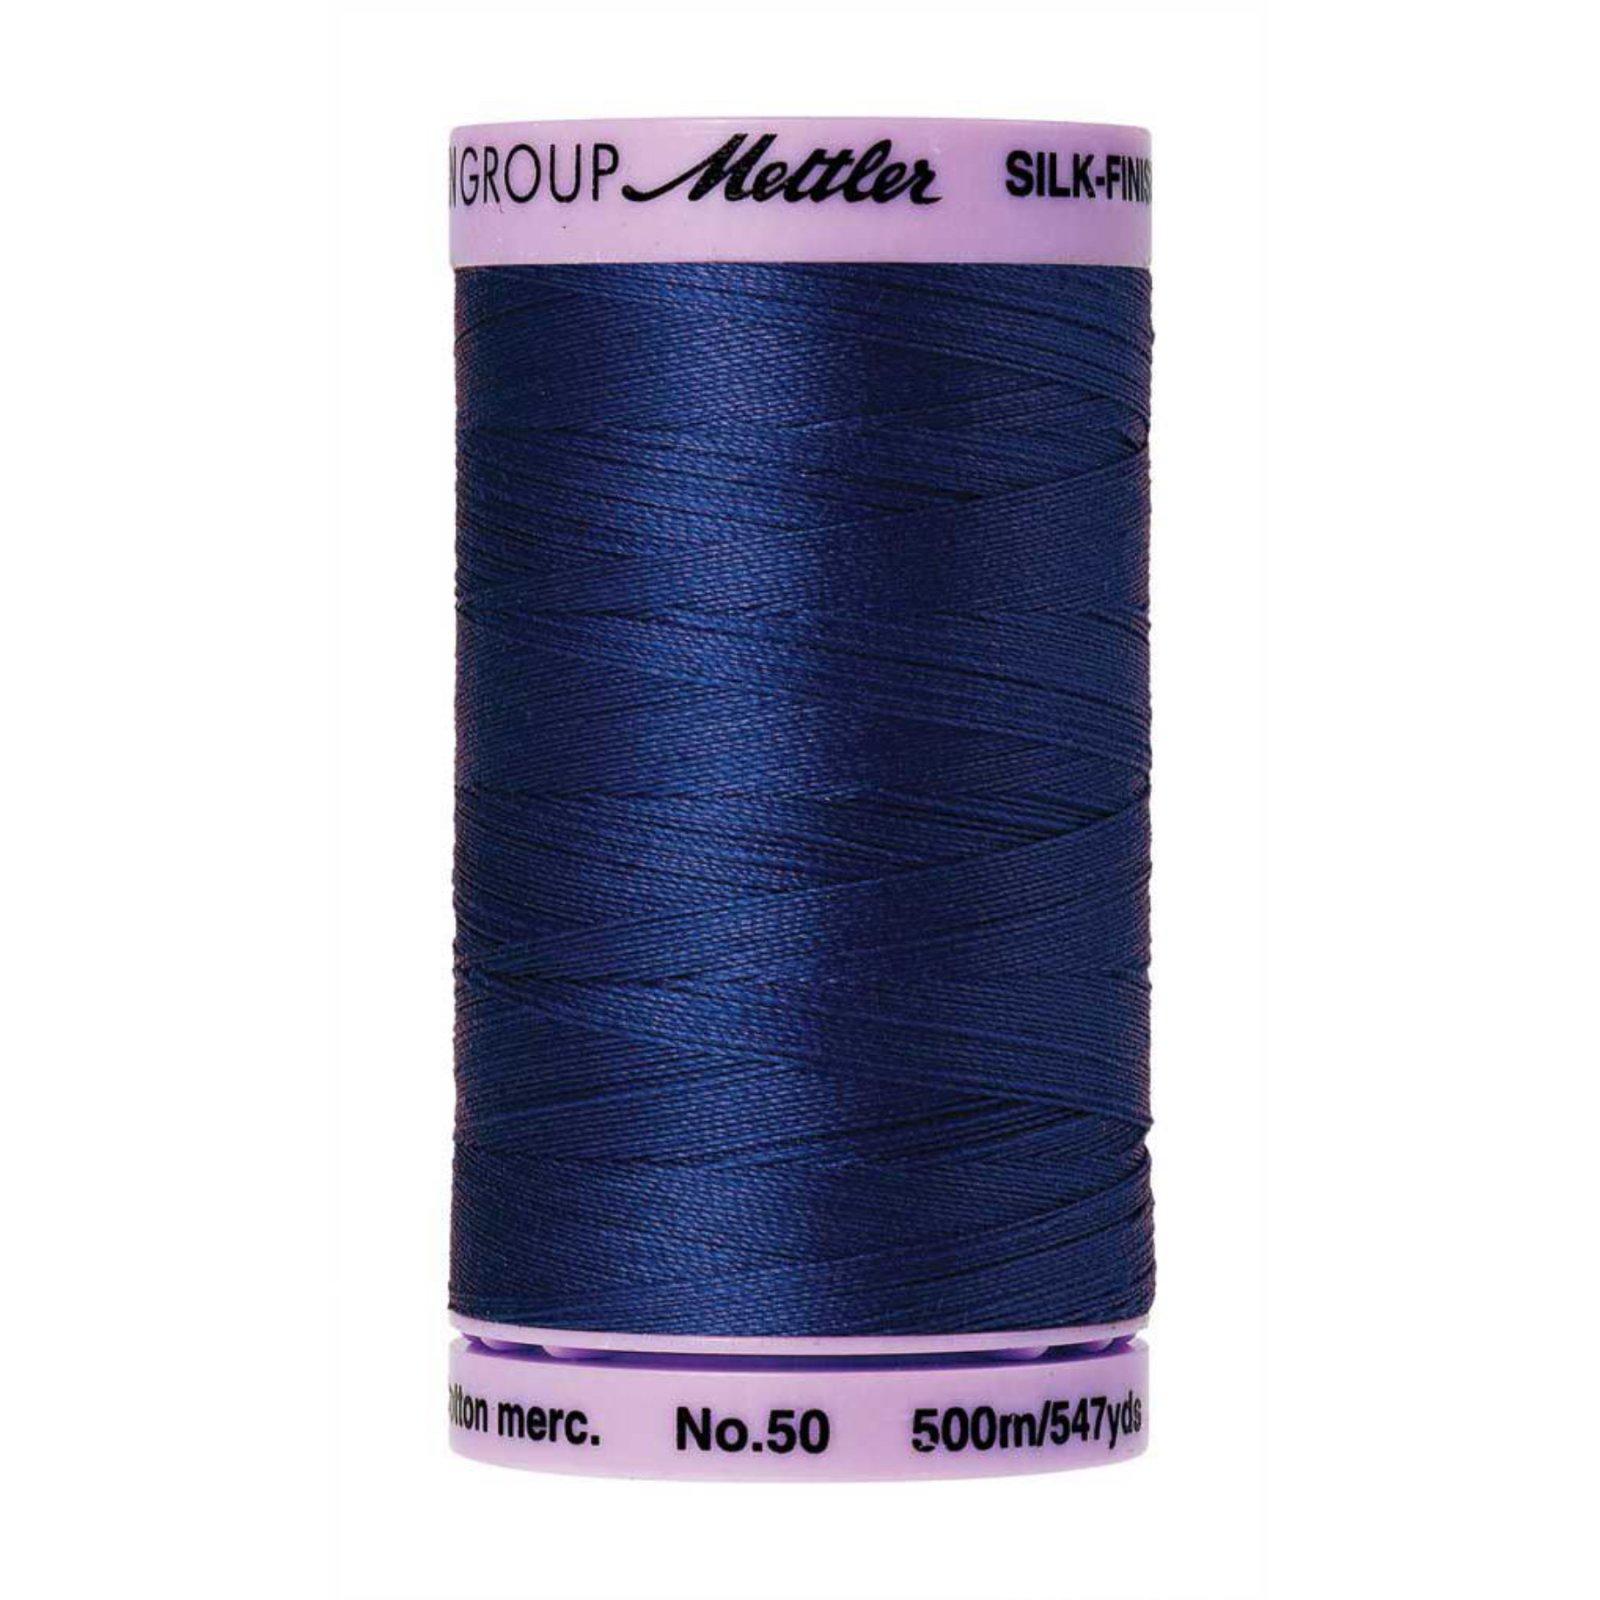 Mettler Silk Finish Cotton Thread Royal Blue